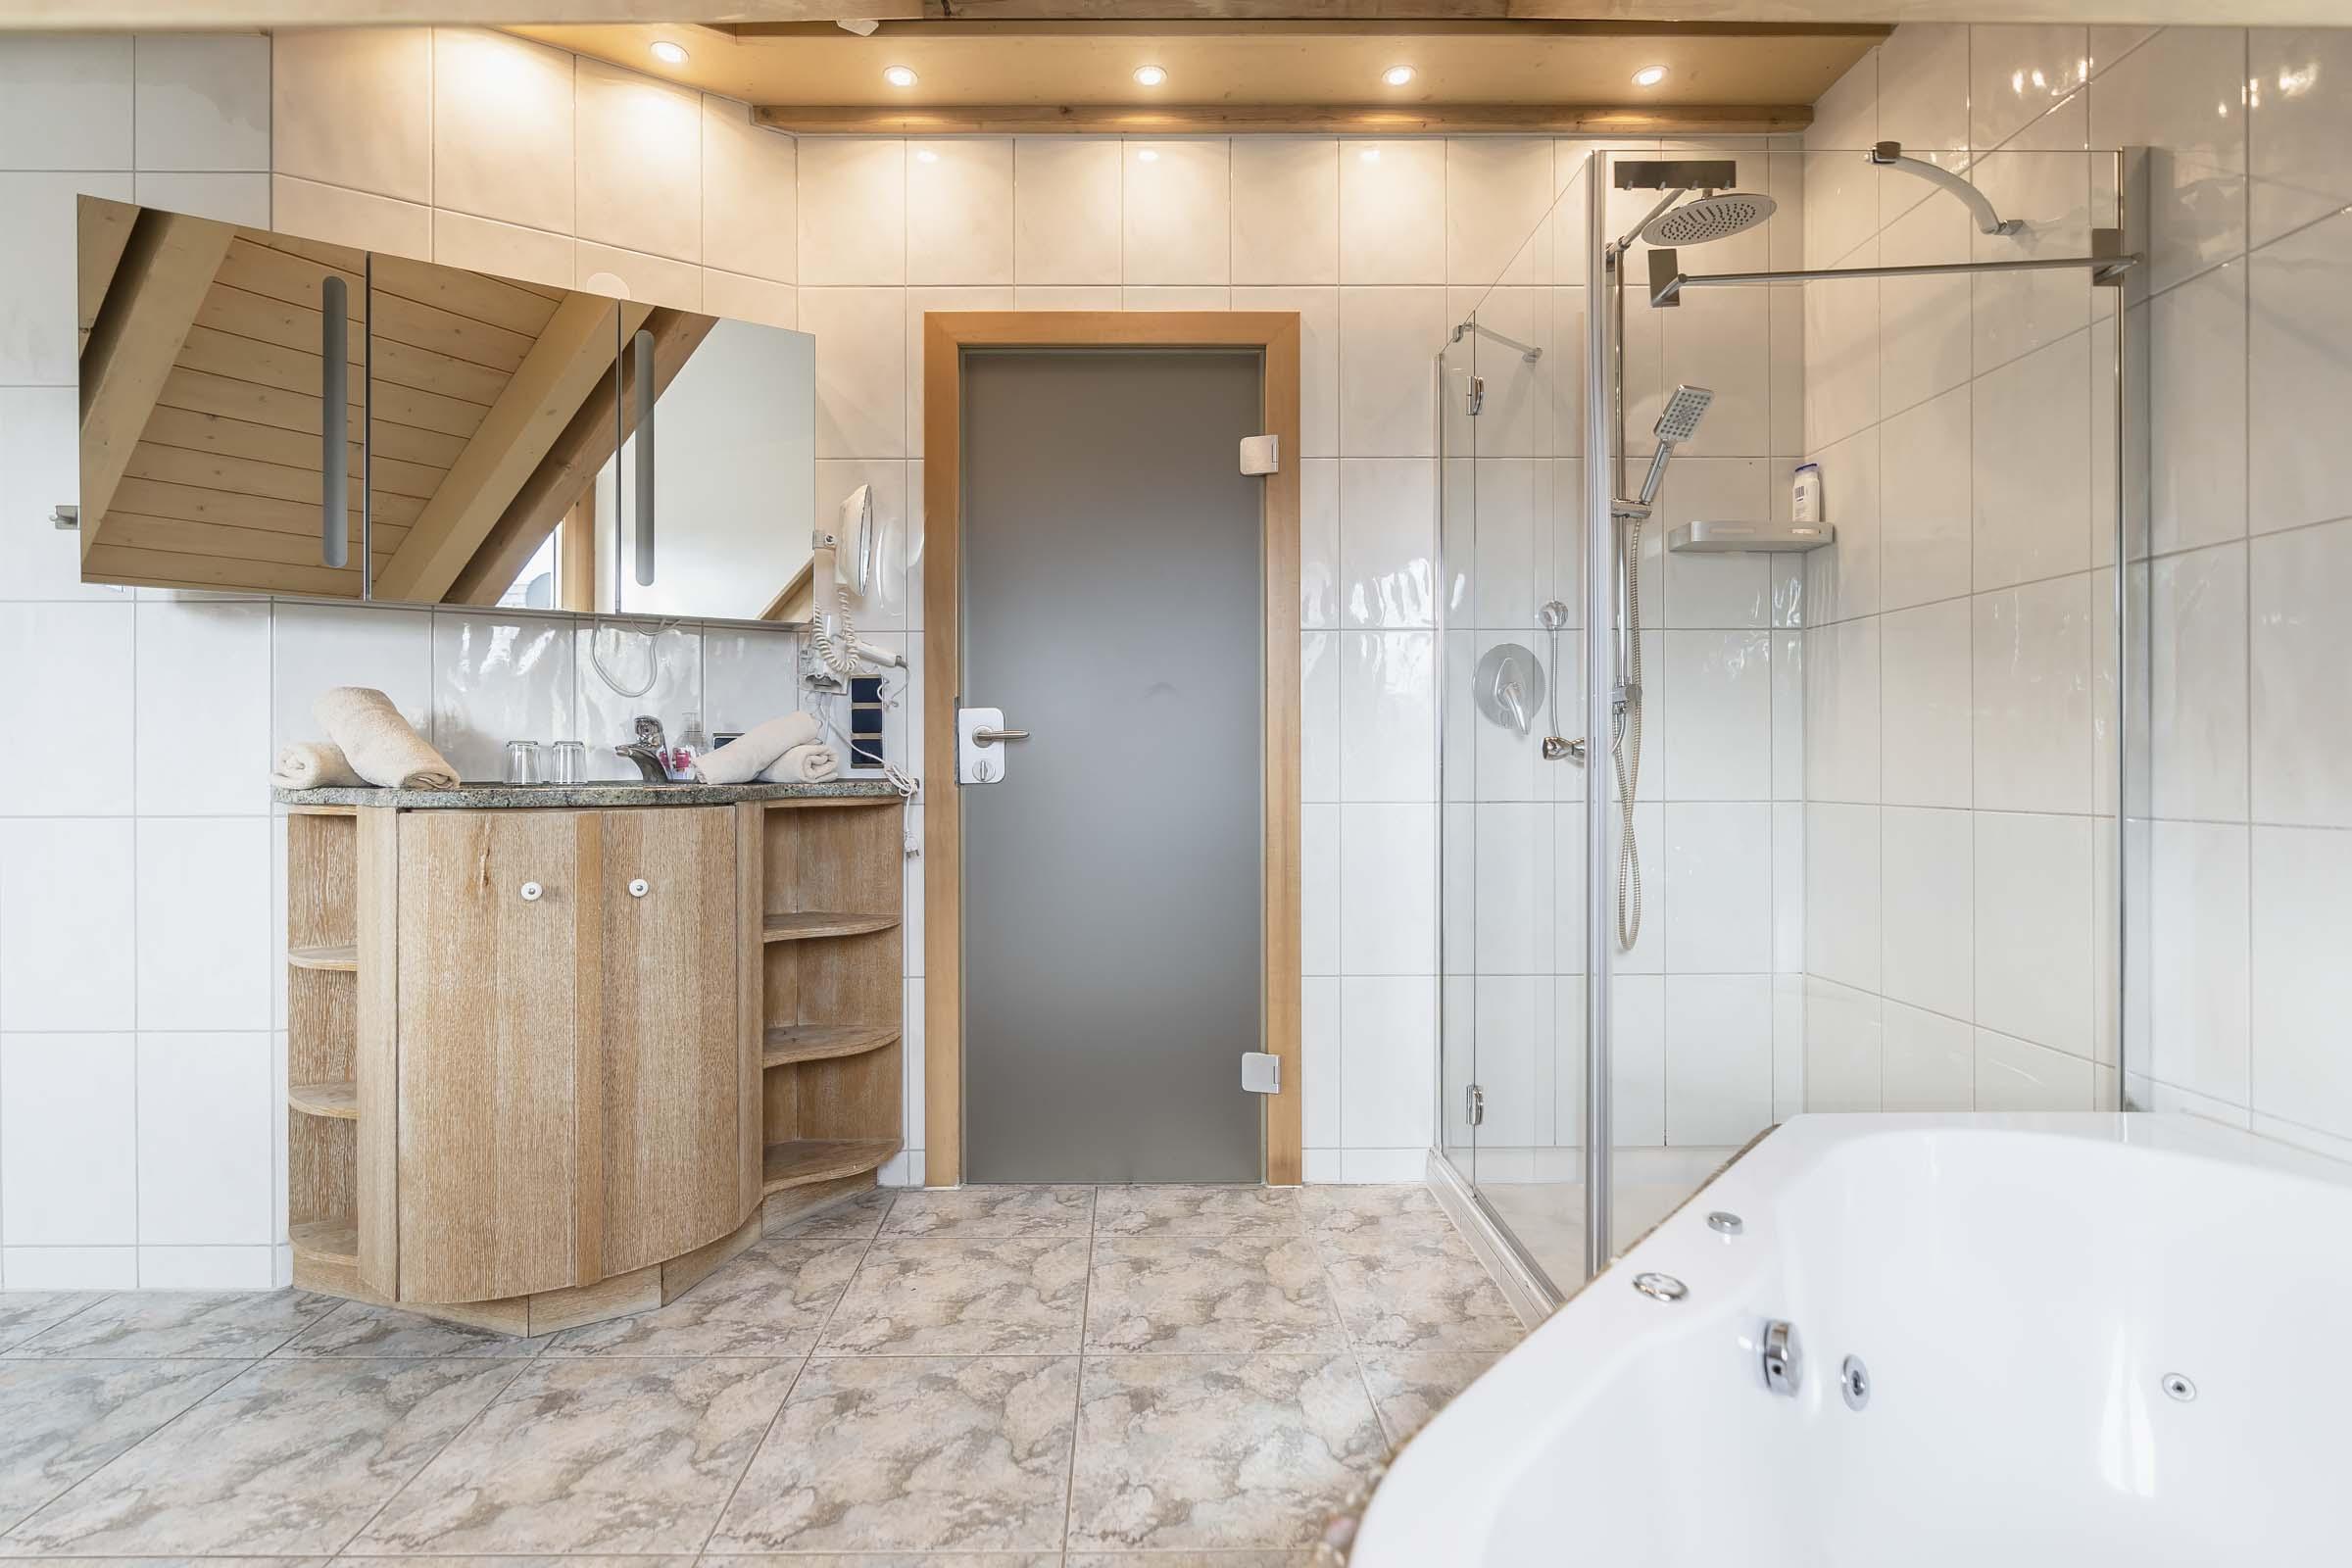 Hotel Haus Am Gries Murnau Apartment Bathroom